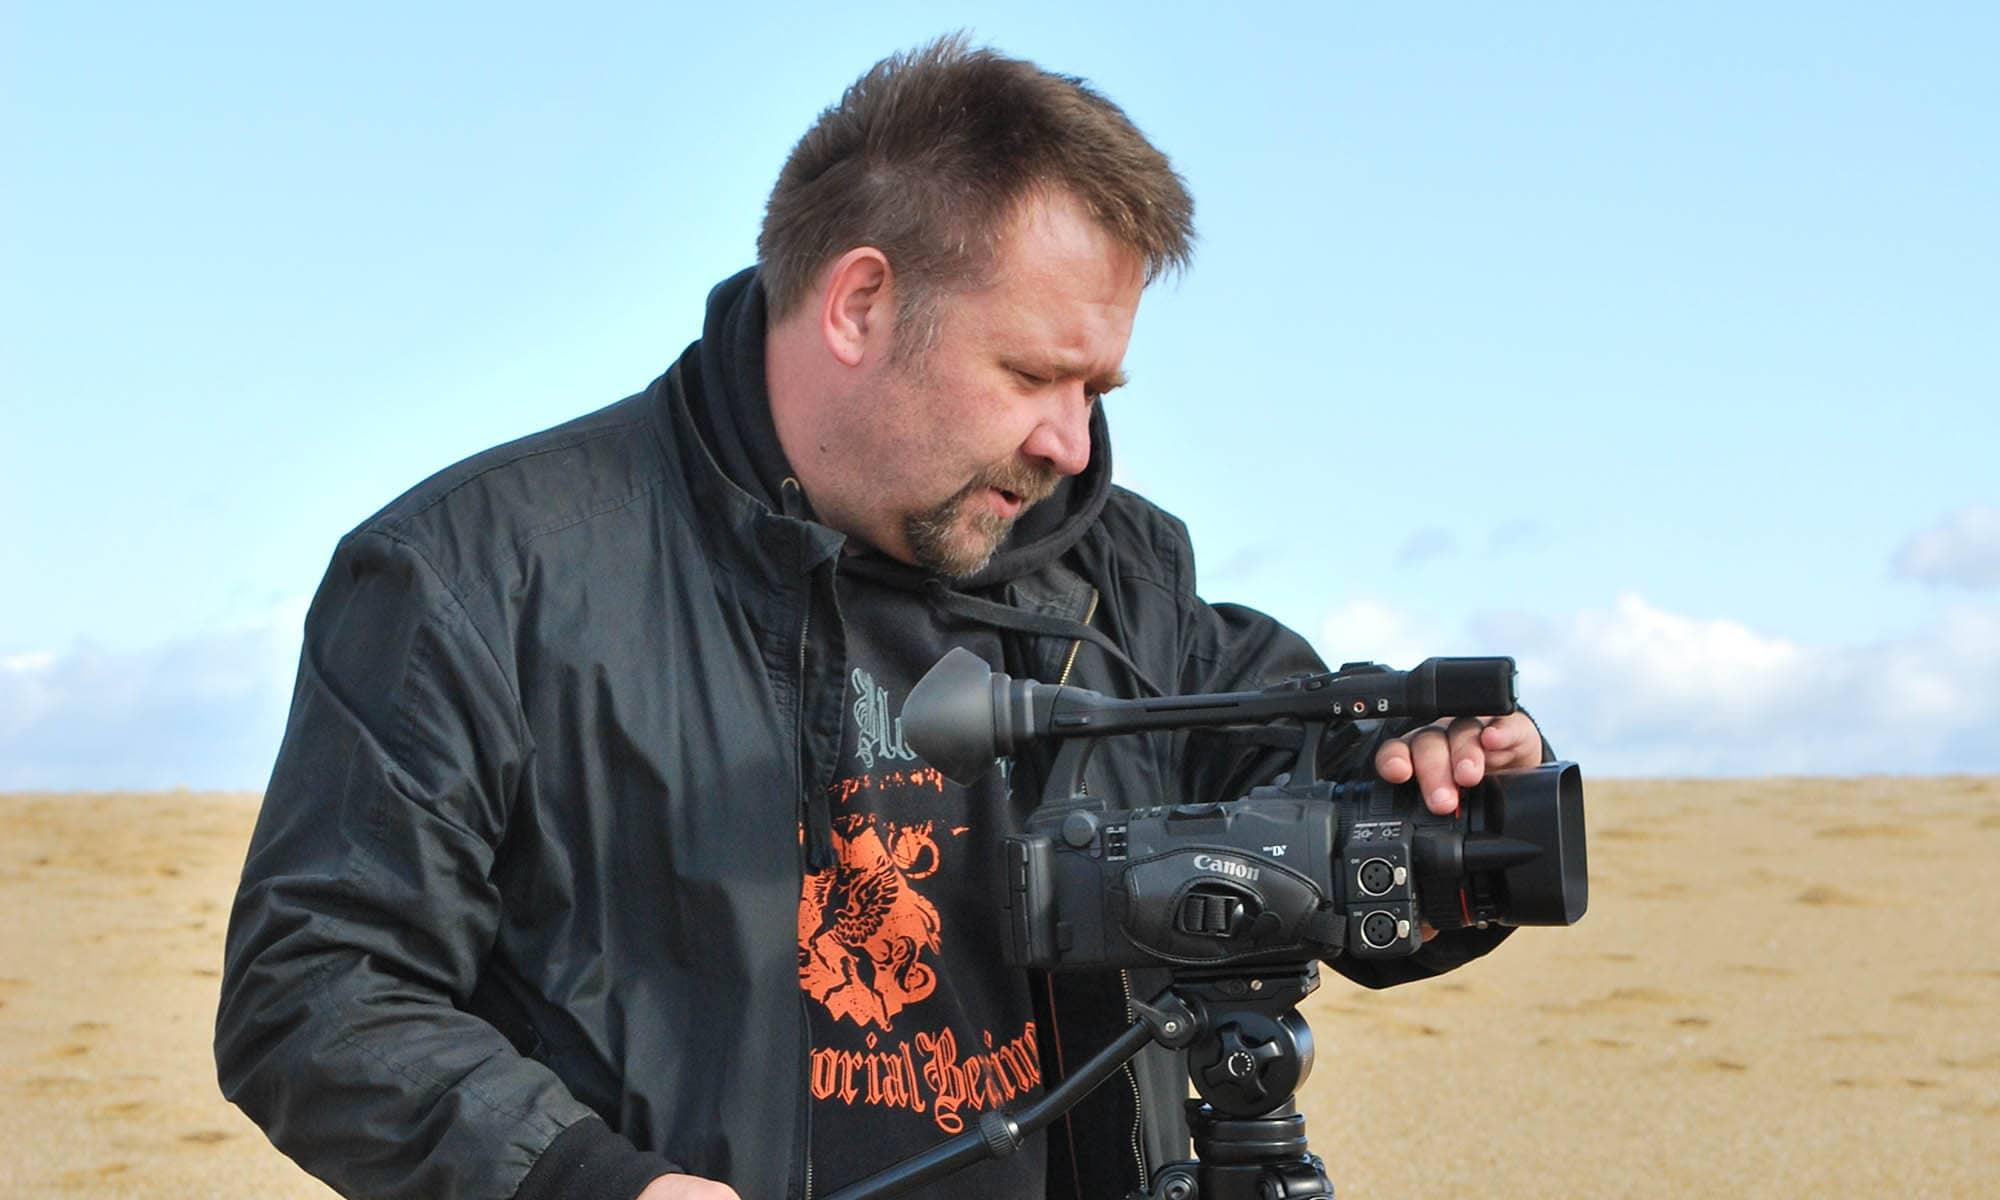 cameraman-plage-desert-camera